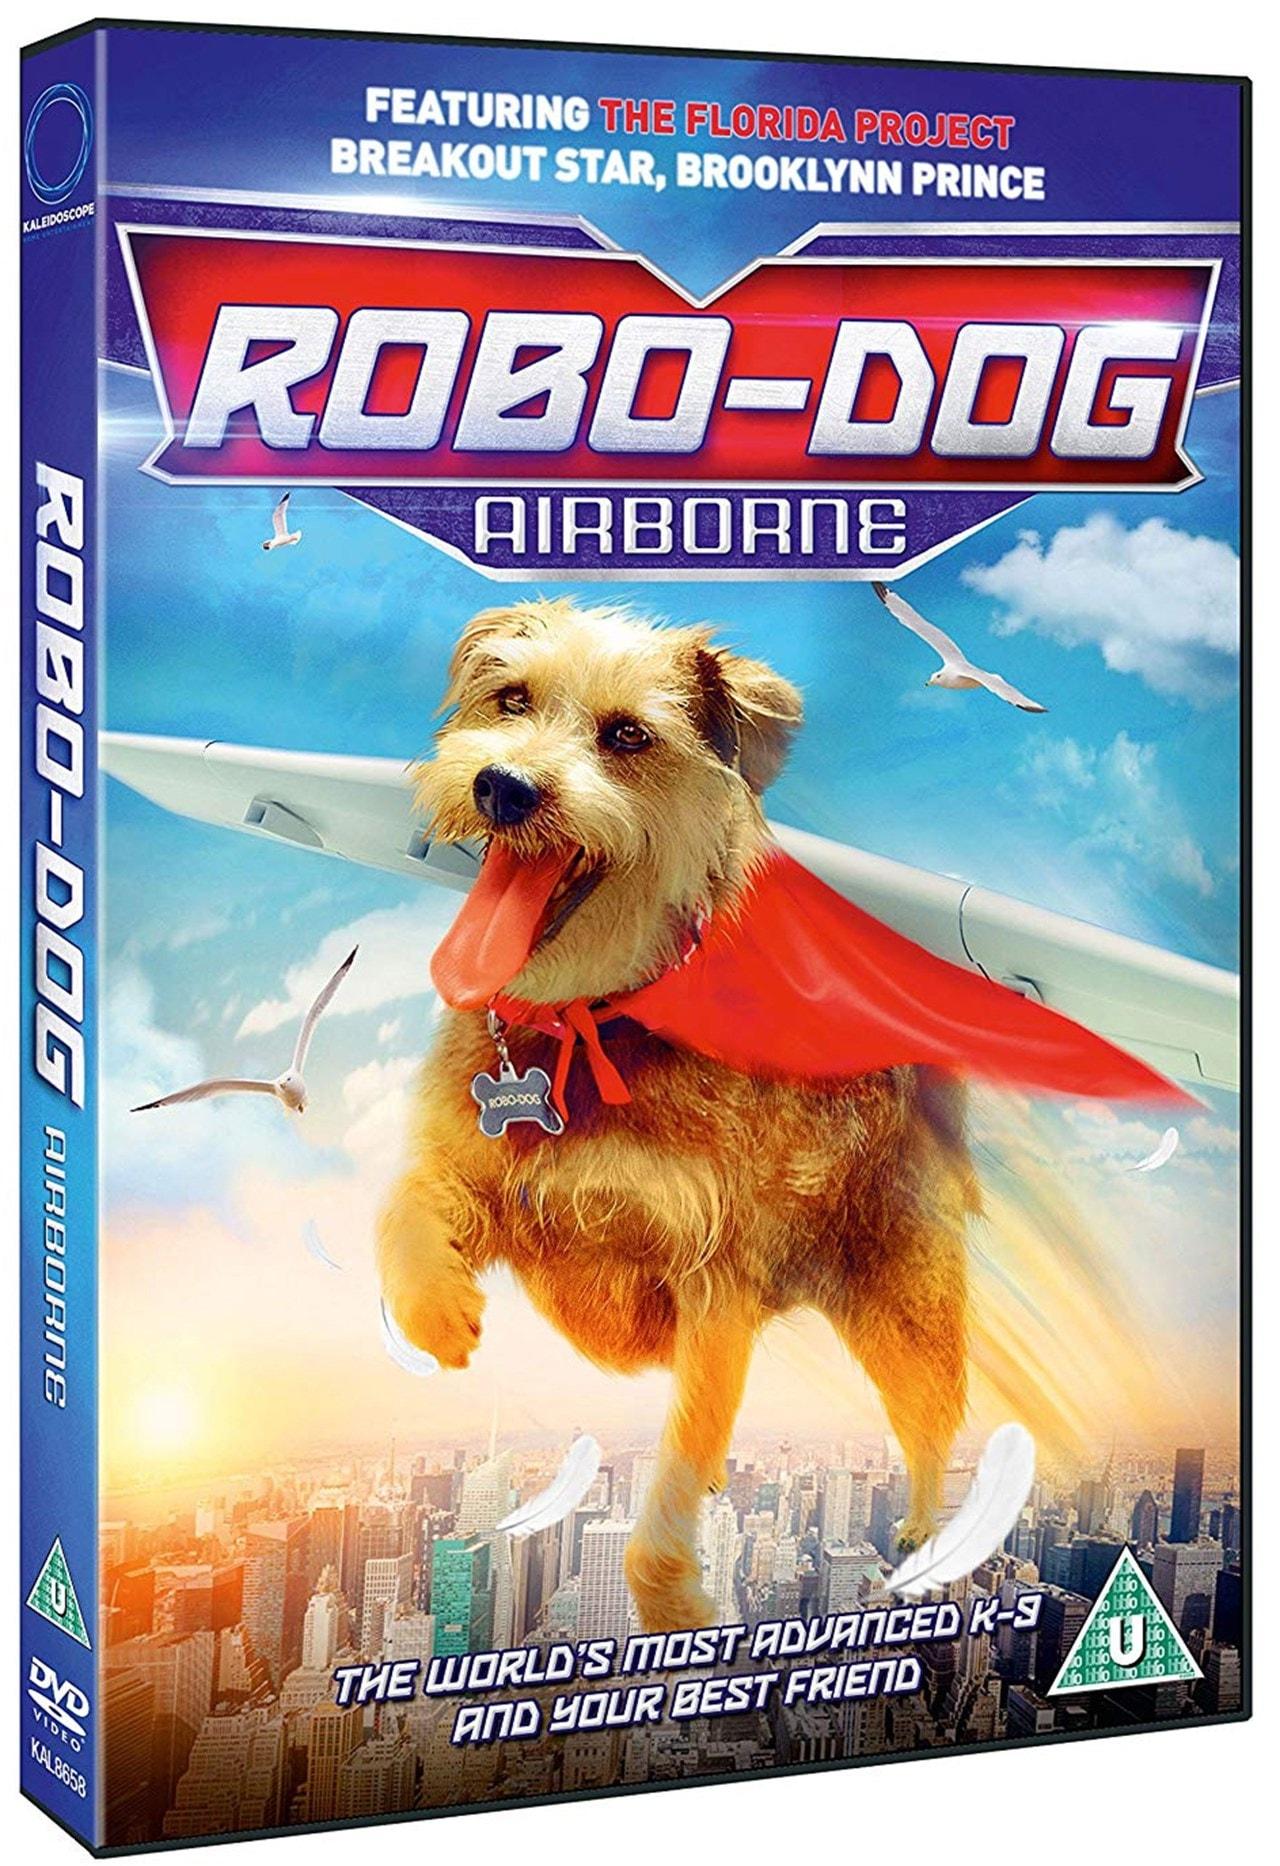 Robo-dog: Airborne - 2